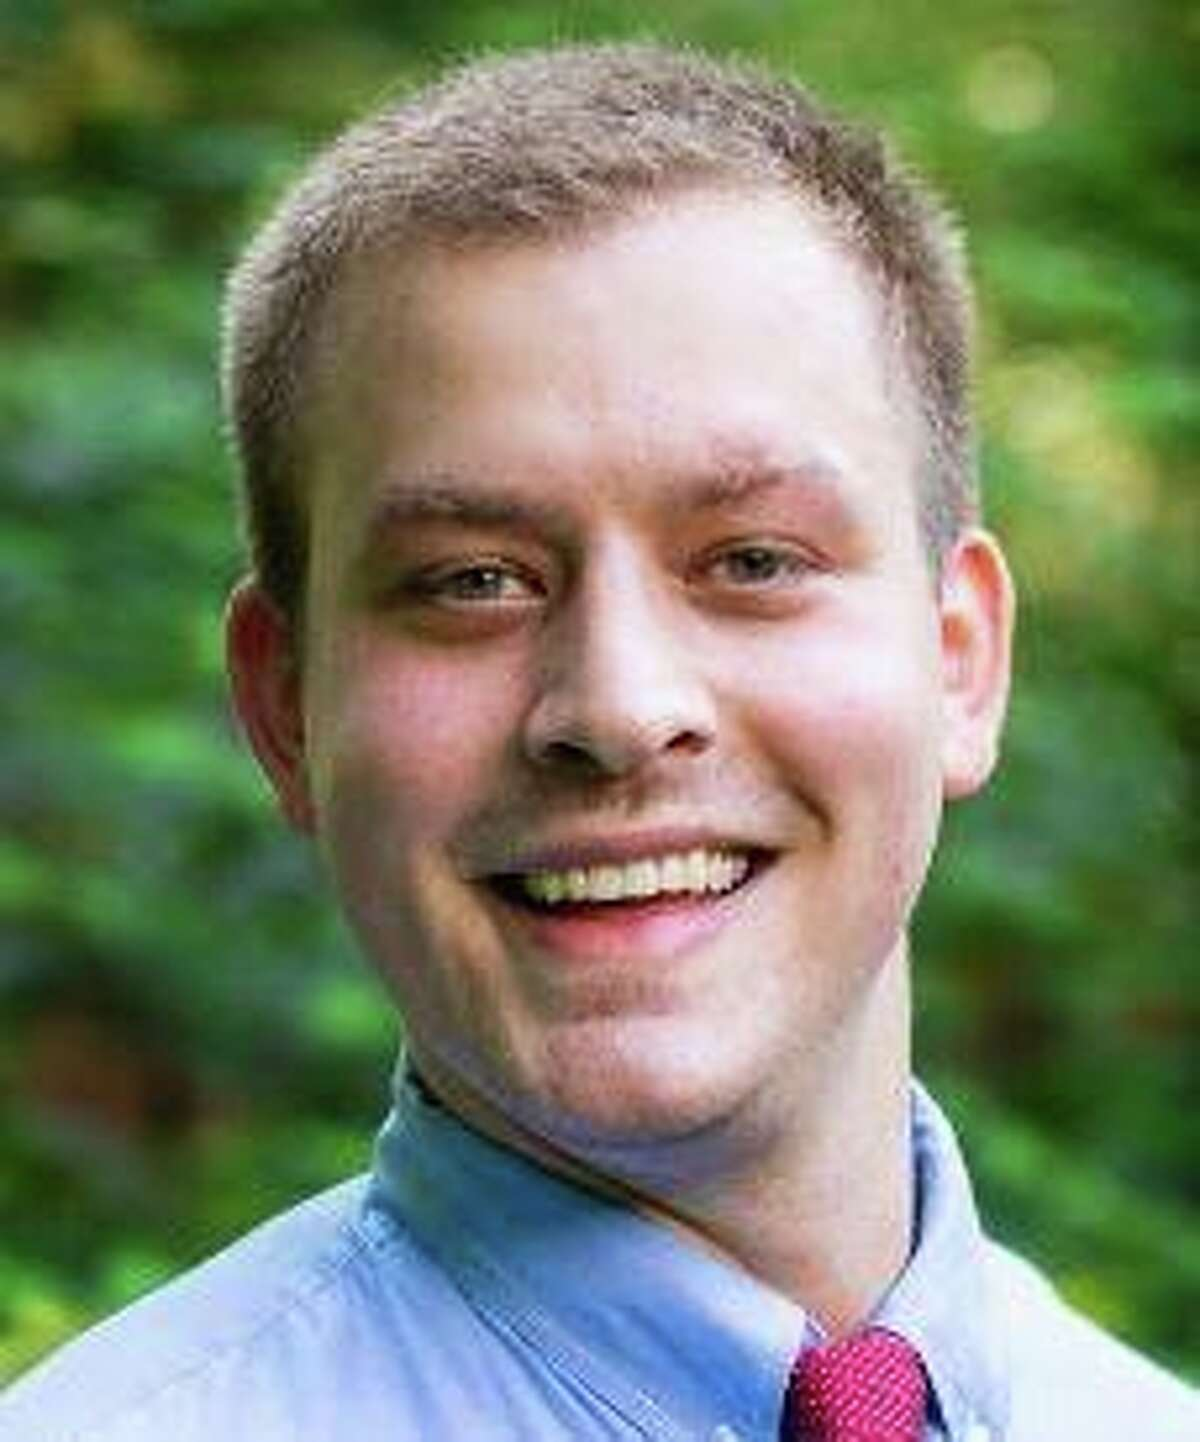 Dan Maymin is the Republican candidate for state representative in District 147 (Stamford, Darien).